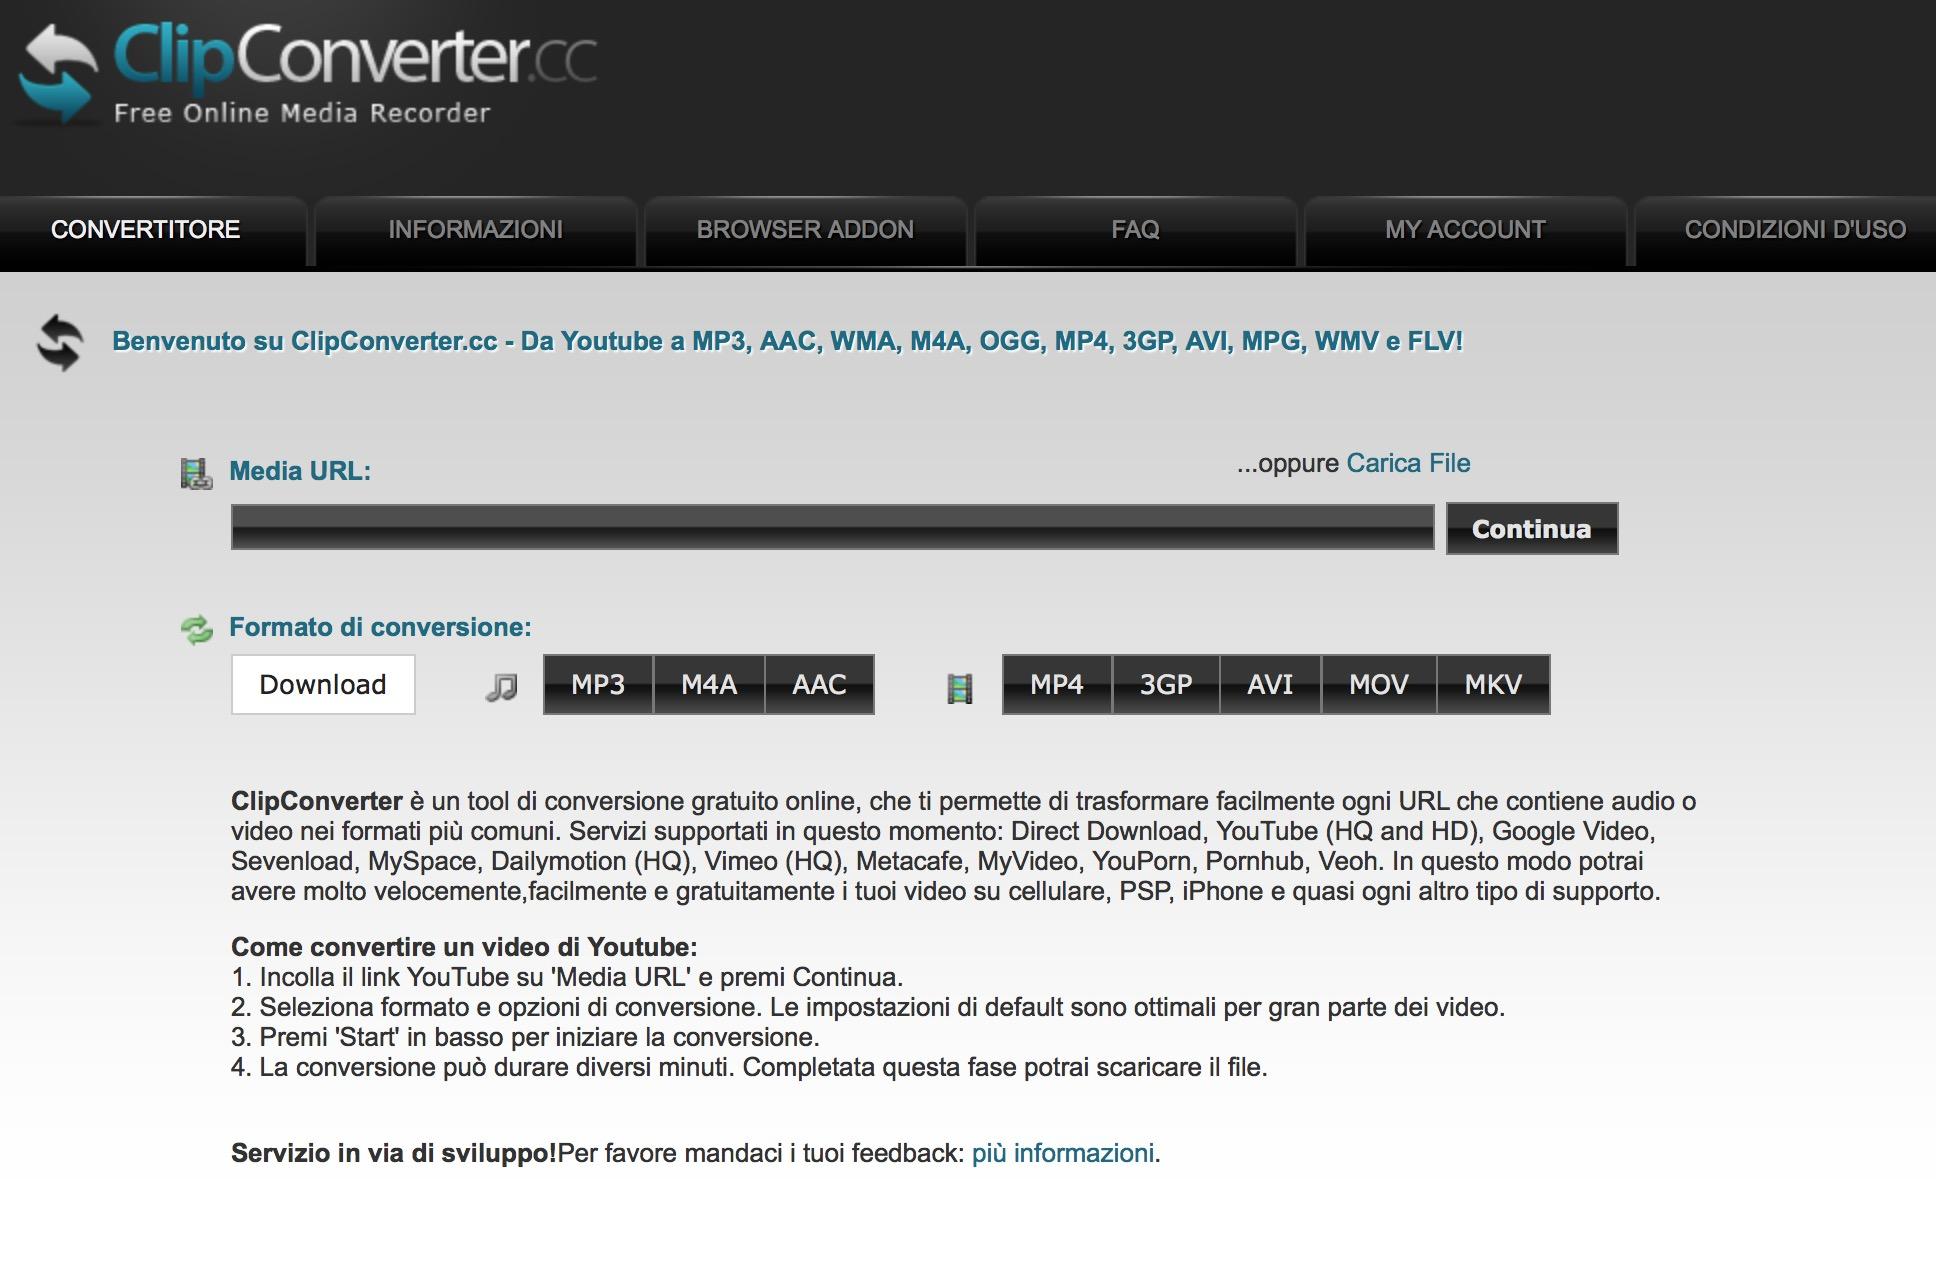 ClipConverter scaricare video Facebook